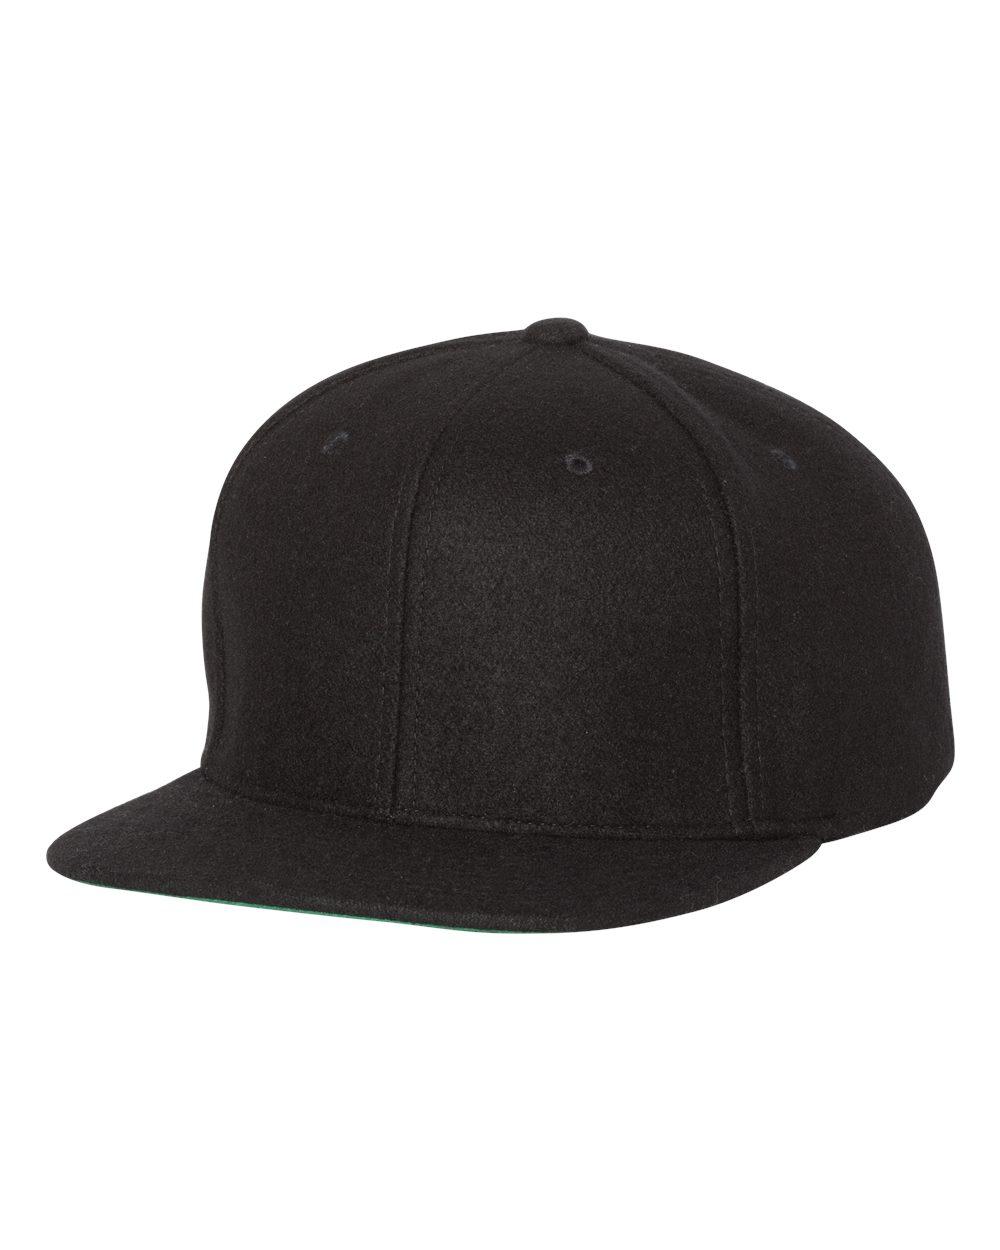 Yupoong 6689 - Melton Wool Snapback Cap